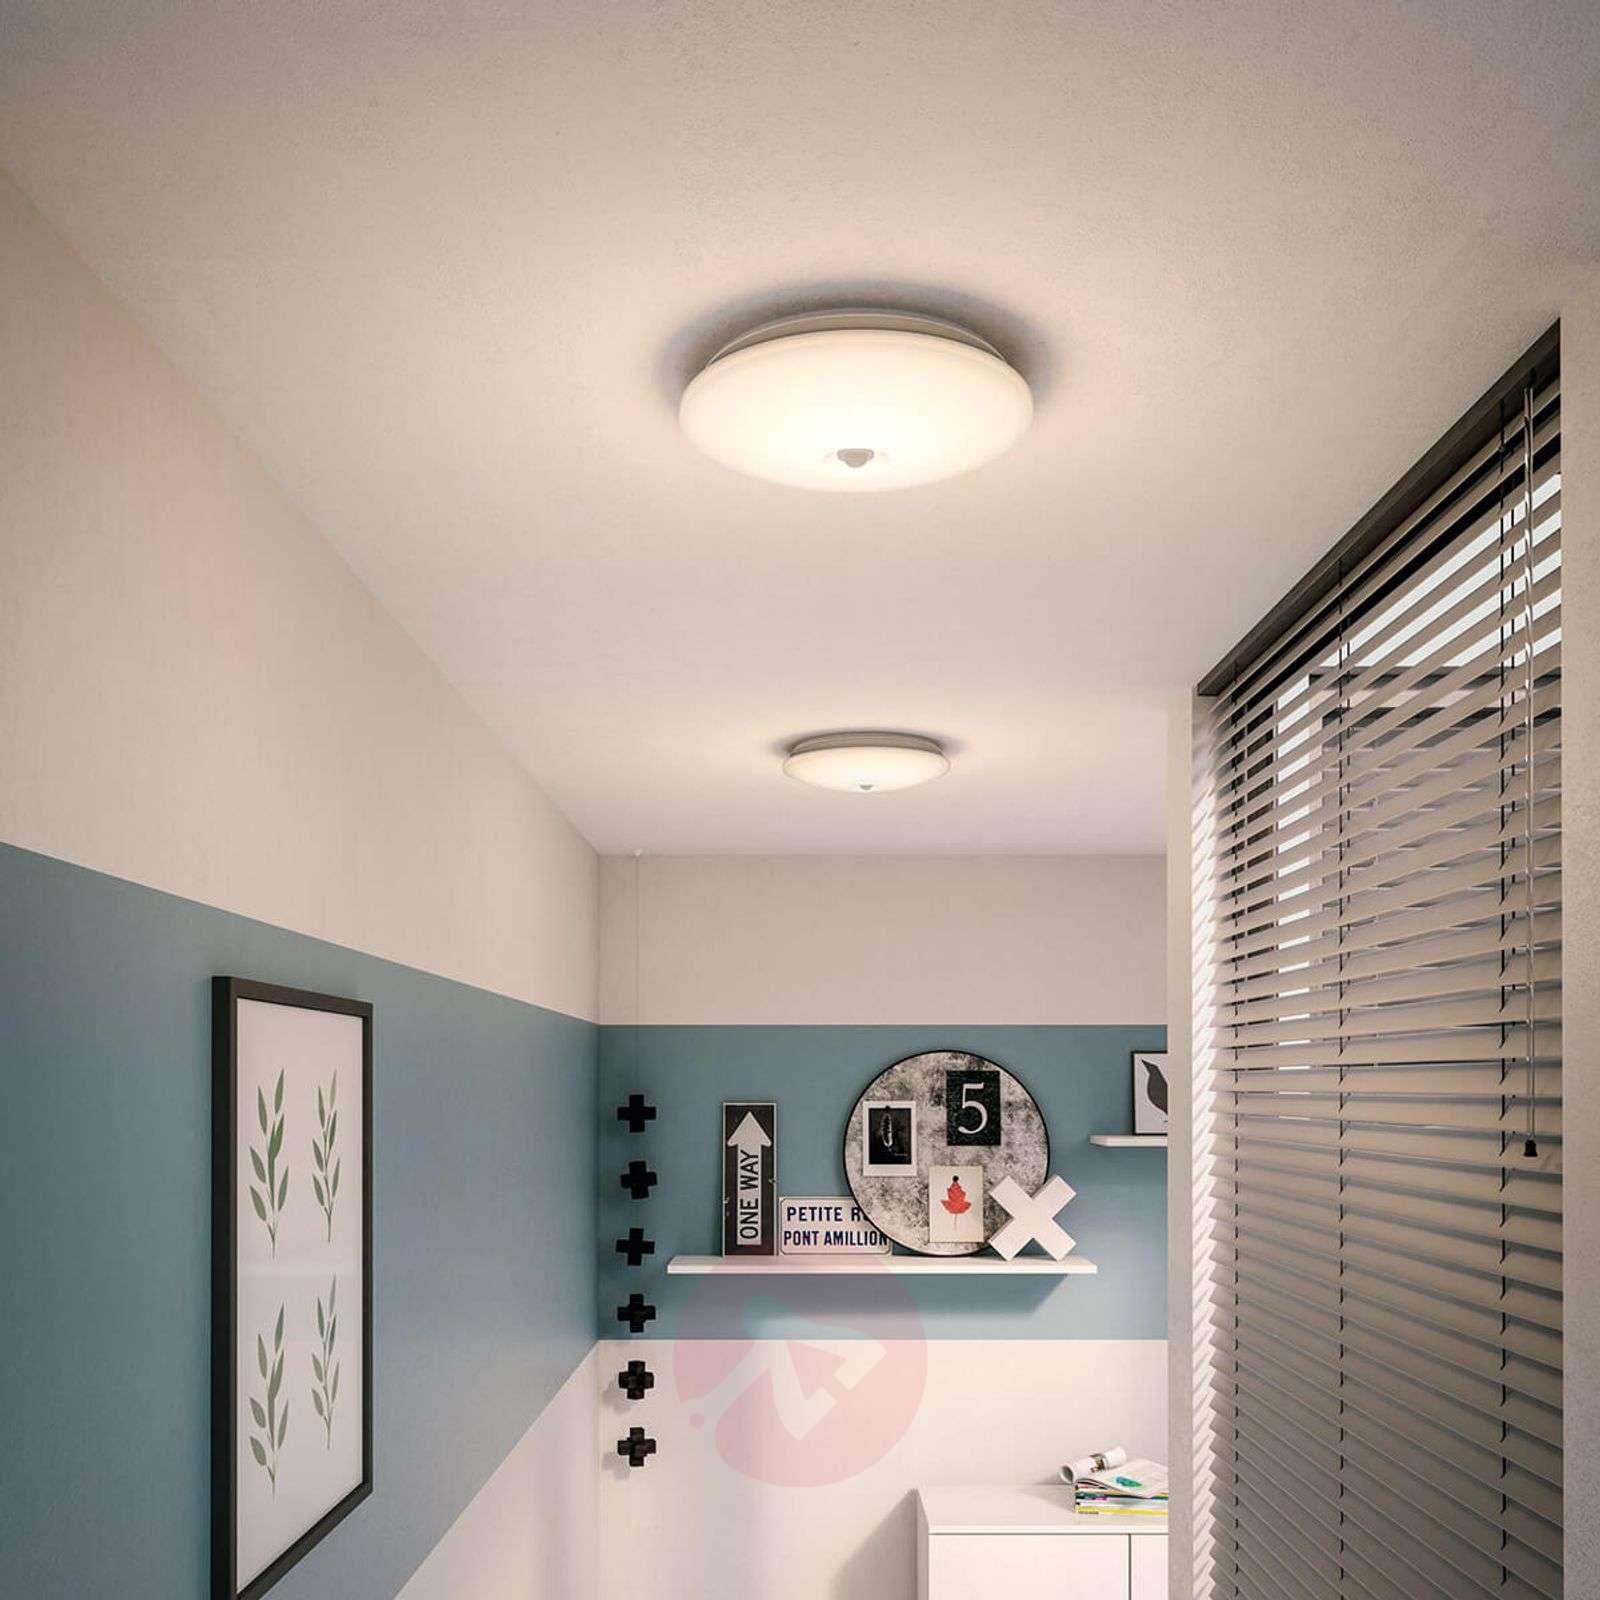 LED ceiling lamp Mauve, IR sensor, diameter 32 cm-7531984-01